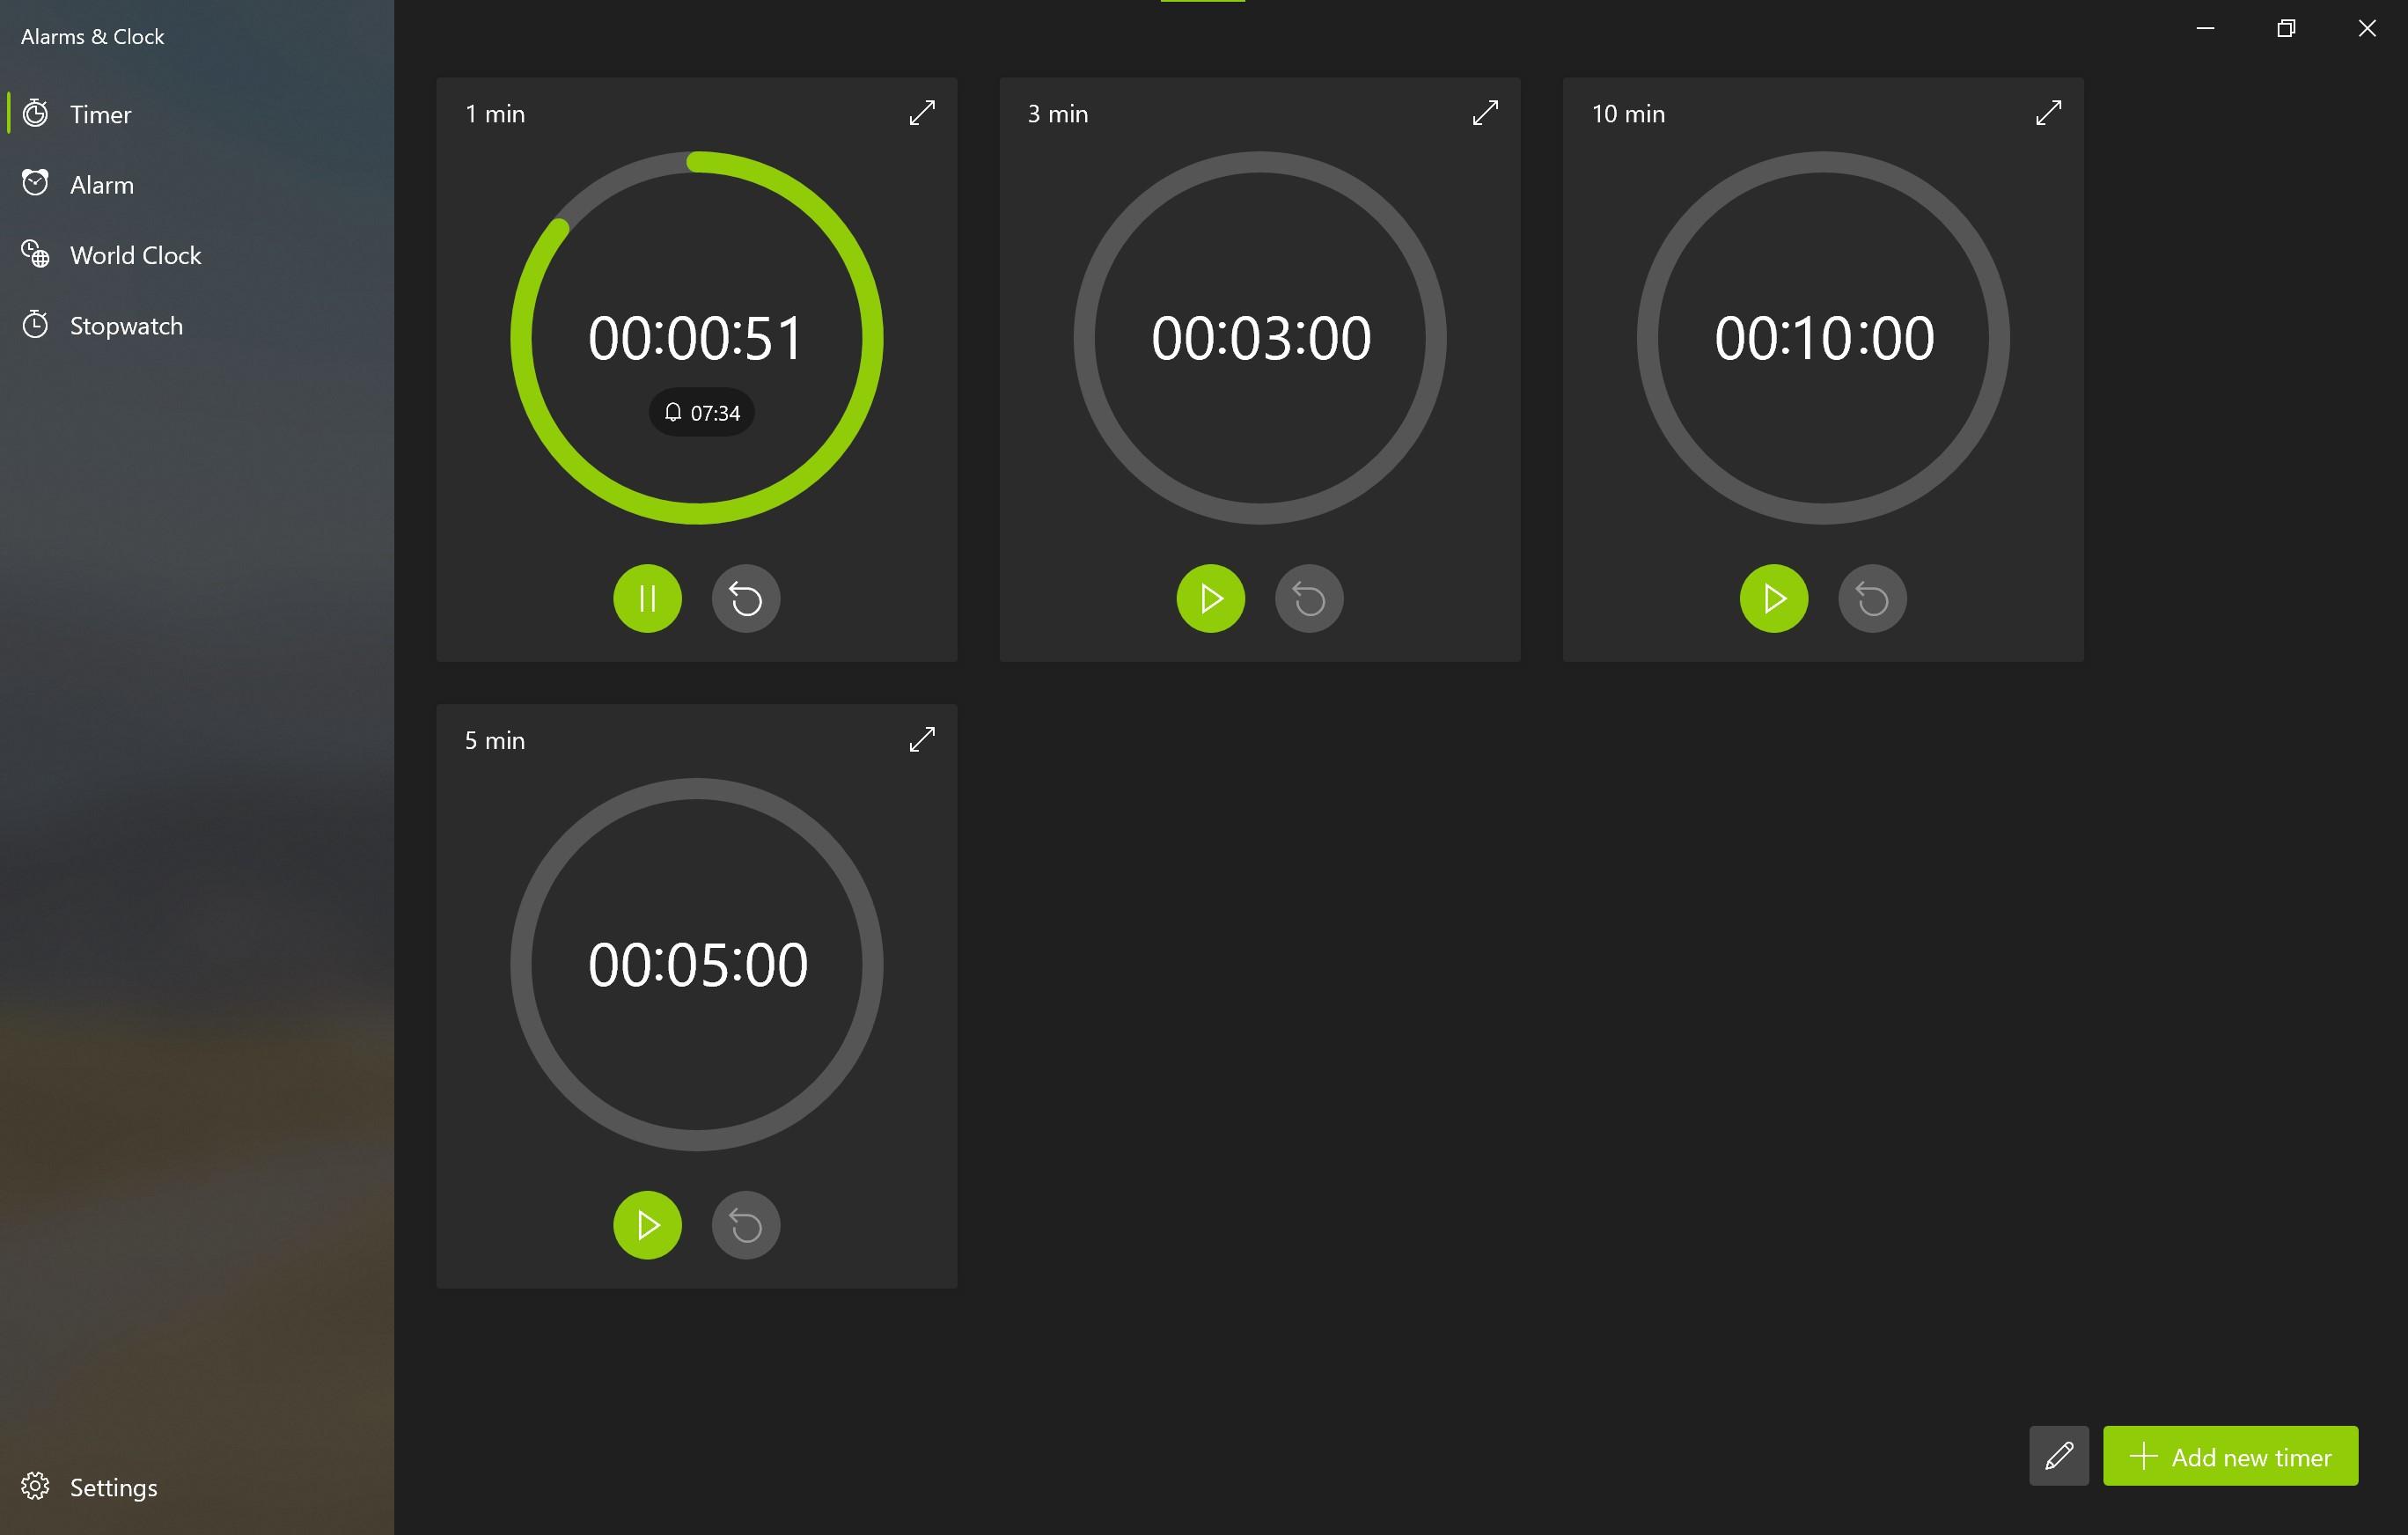 Alarms And Clocks Screenshot 6